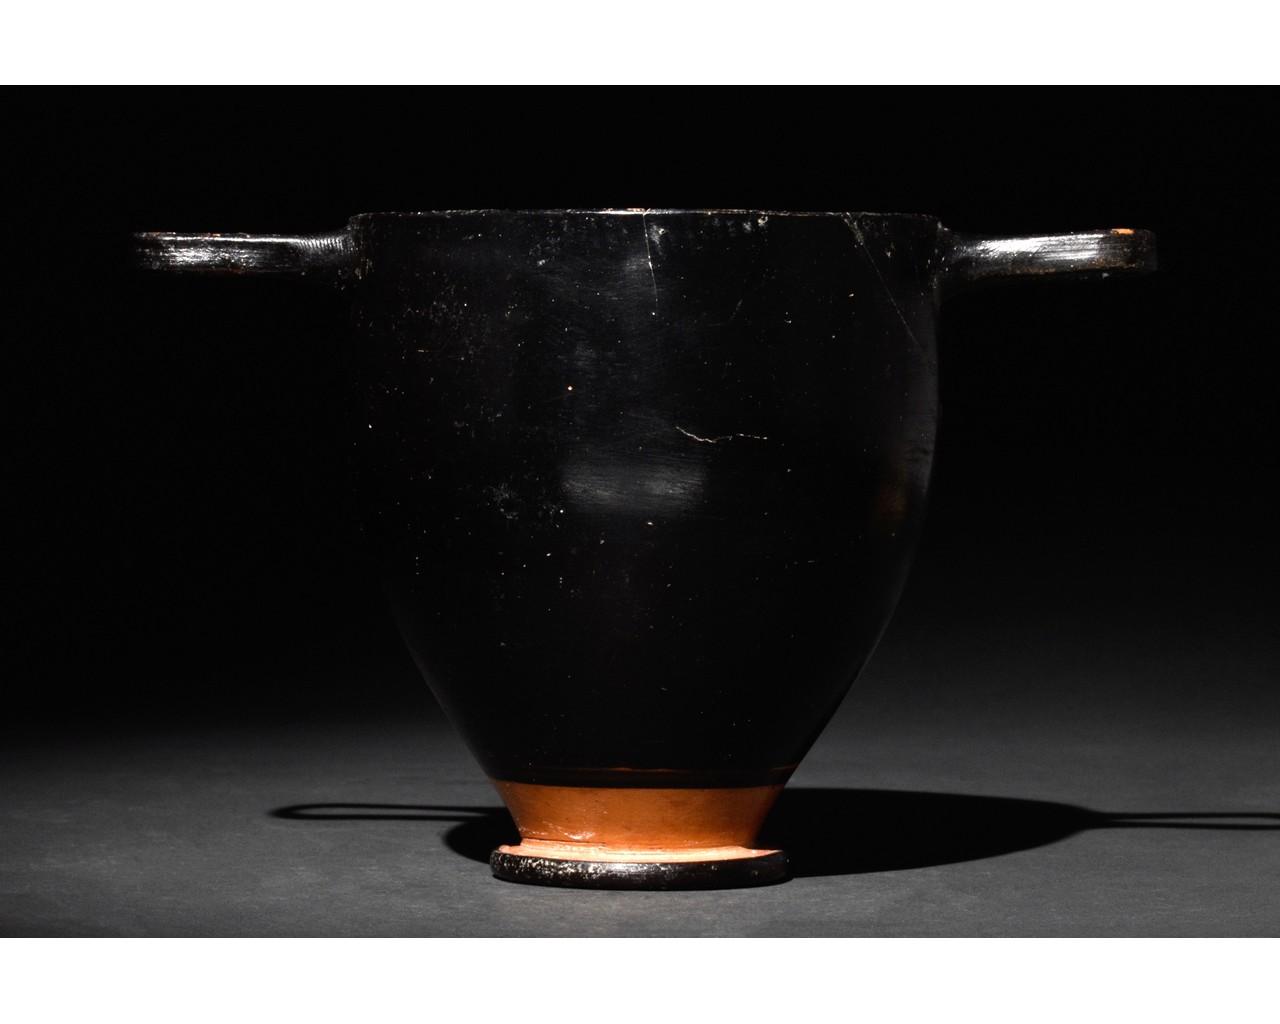 GREEK APULIAN BLACK-GLAZED POTTERY SKYPHOS - Image 3 of 6